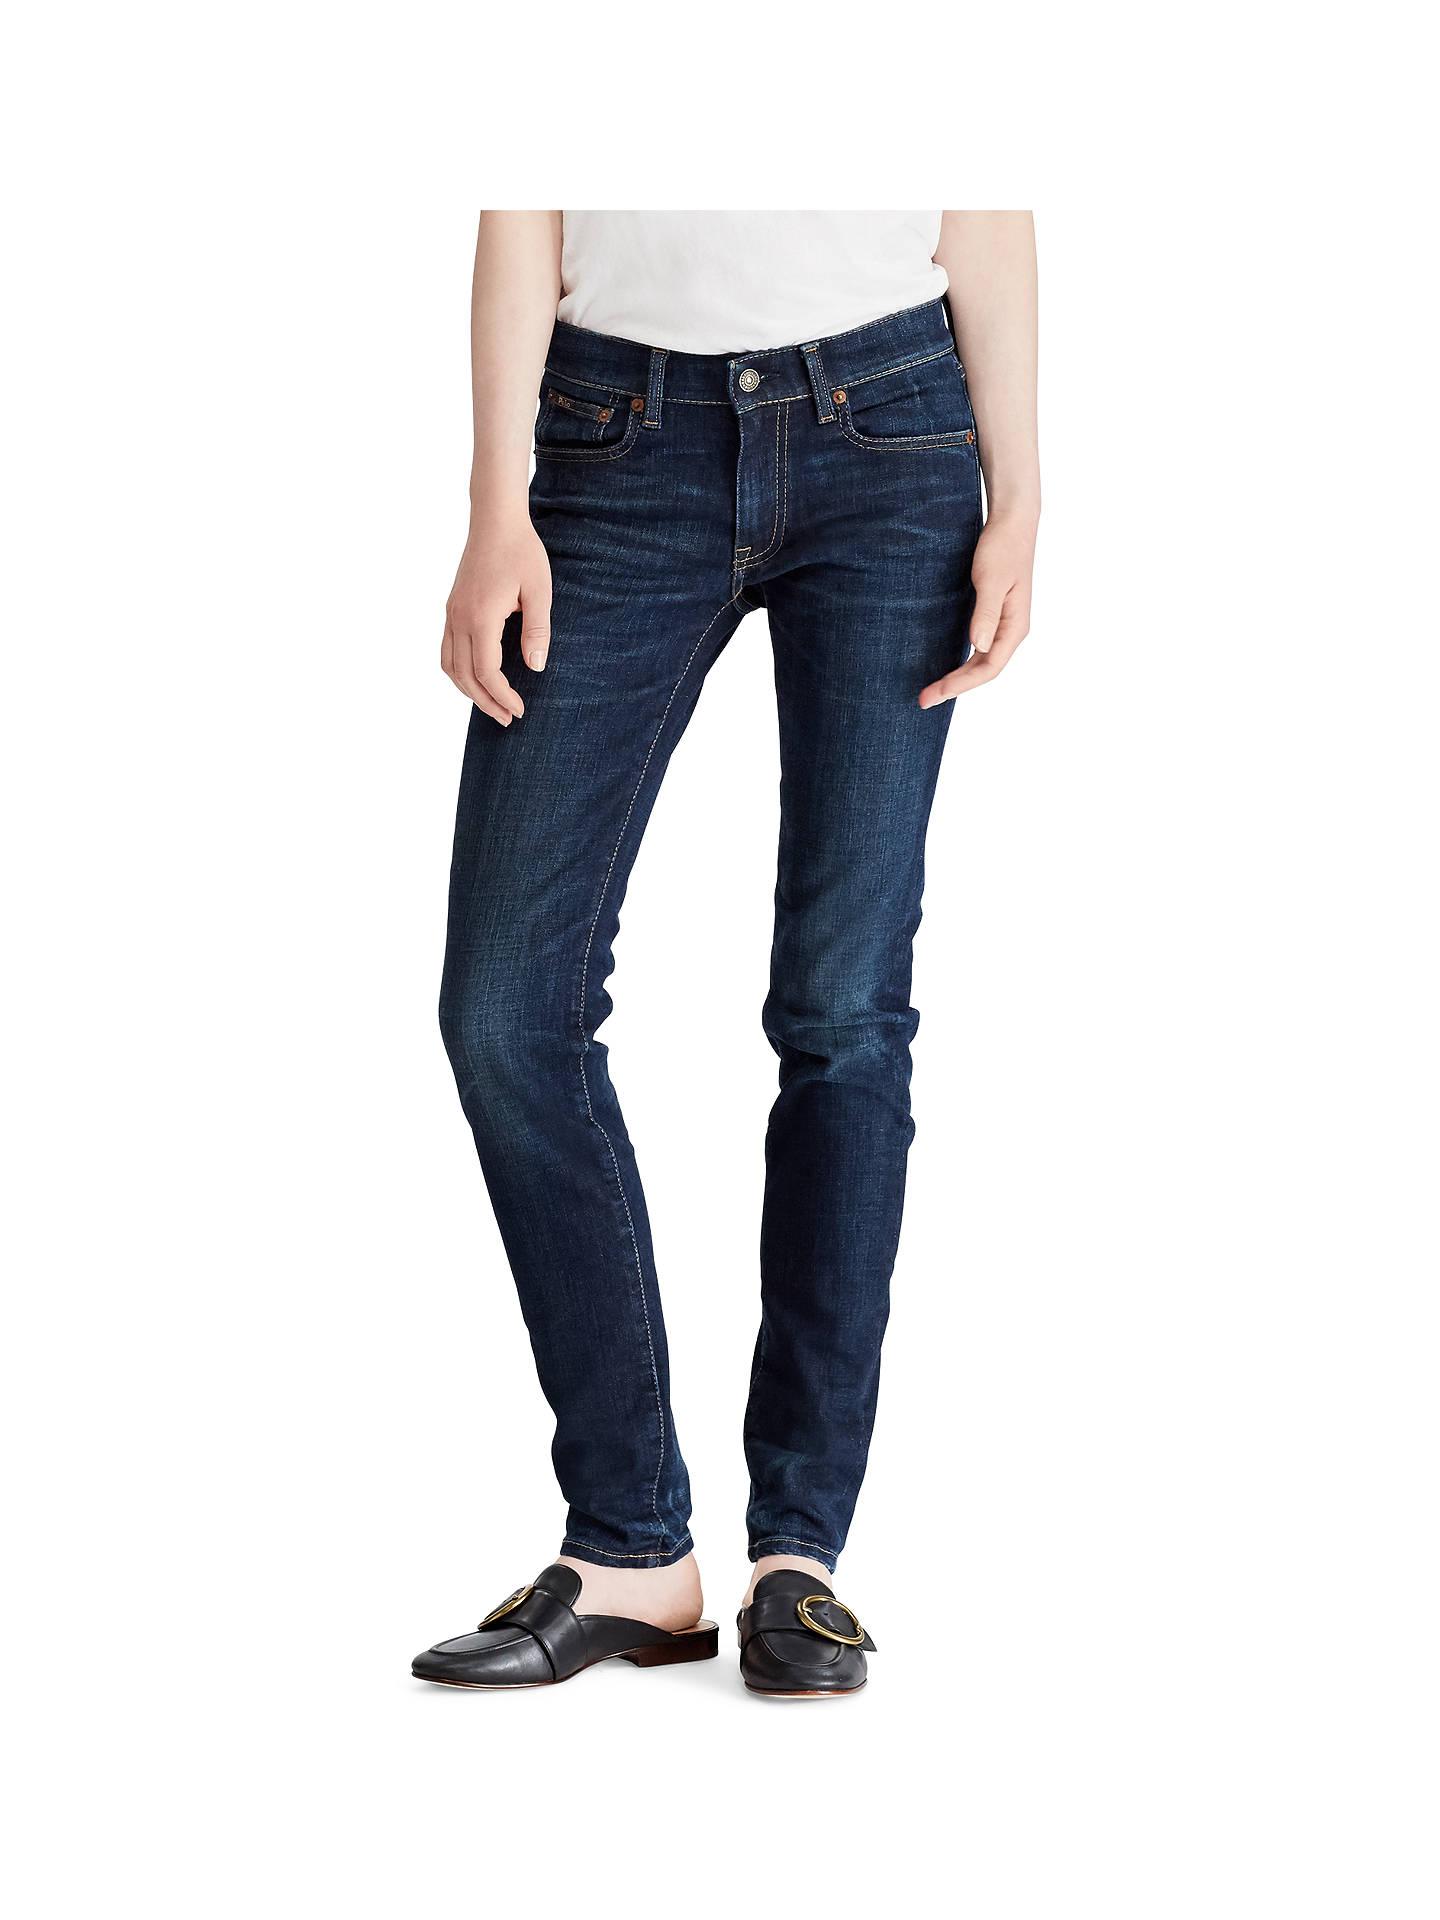 1659003111 Polo Ralph Lauren Tompkins Skinny Jeans, Indigo Serret Wash at John ...